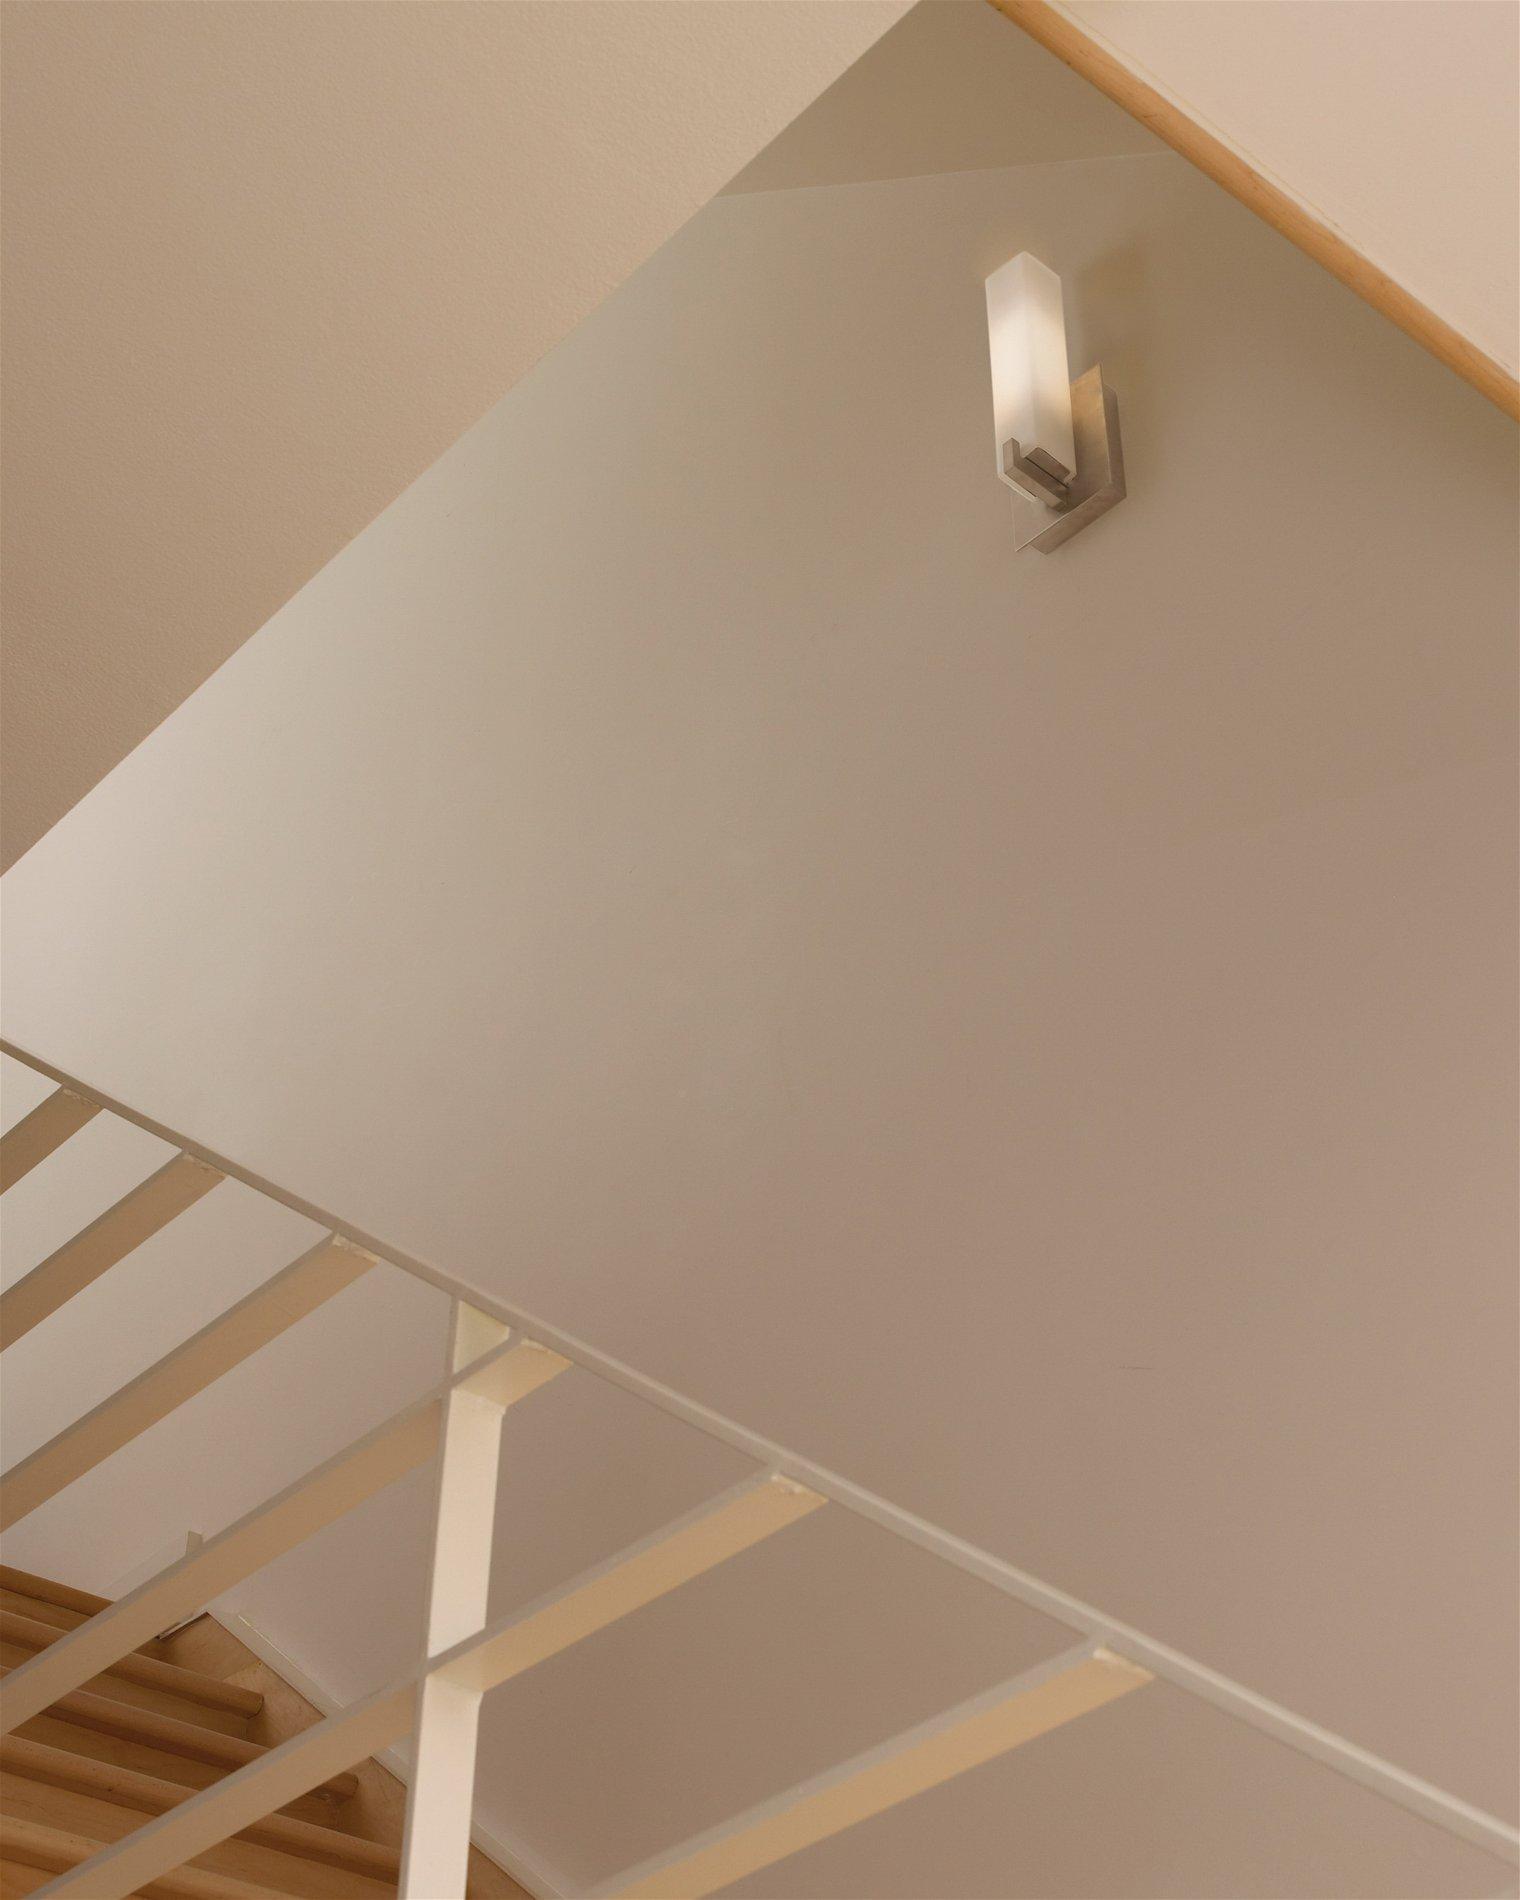 Tech Lighting 700WSCOS Cosmo Modern / Contemporary Wall Sconce 700WSCOS